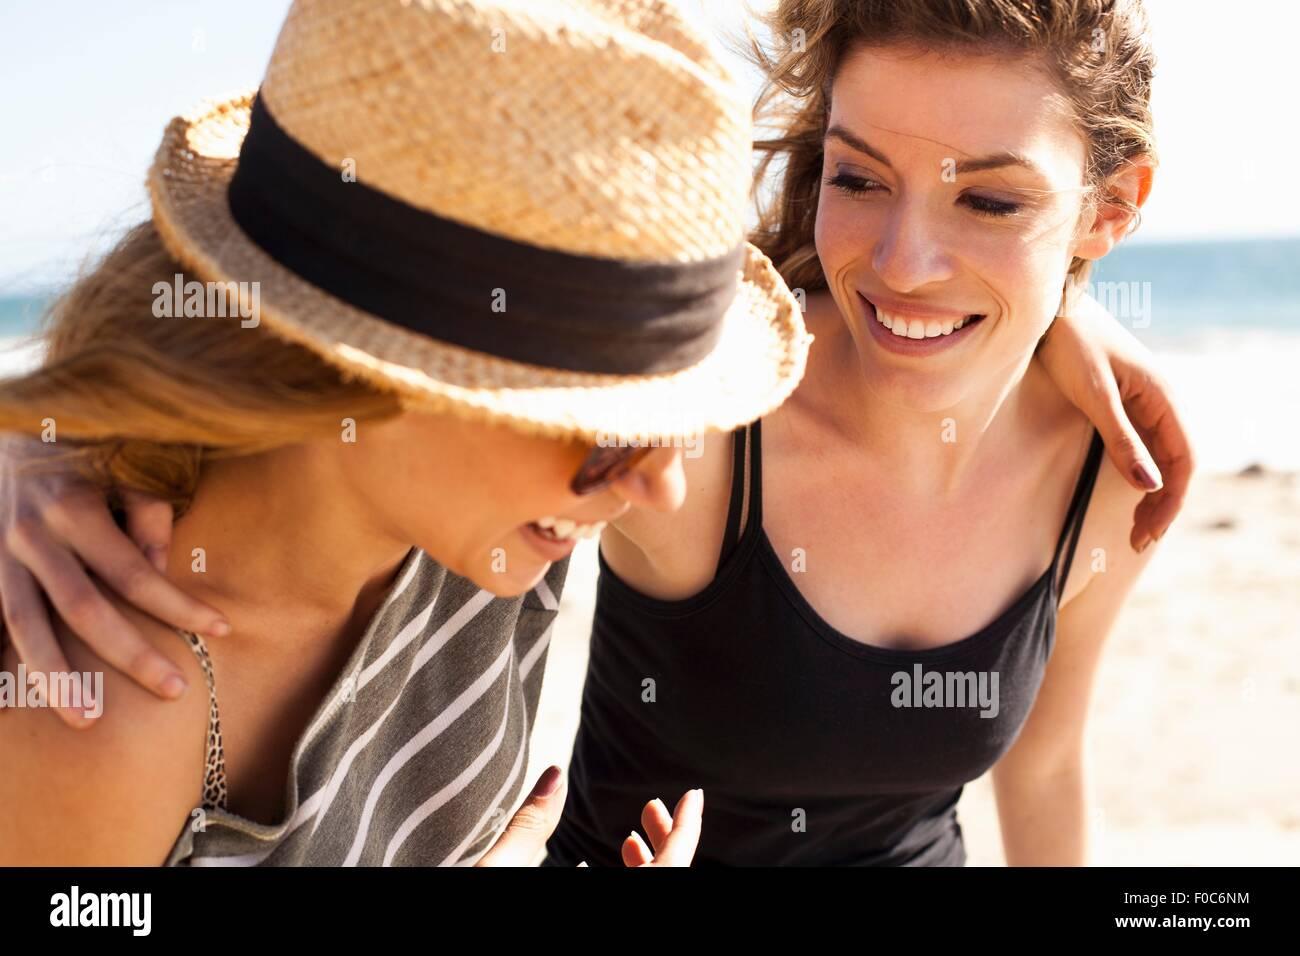 Girlfriends relaxing on beach - Stock Image